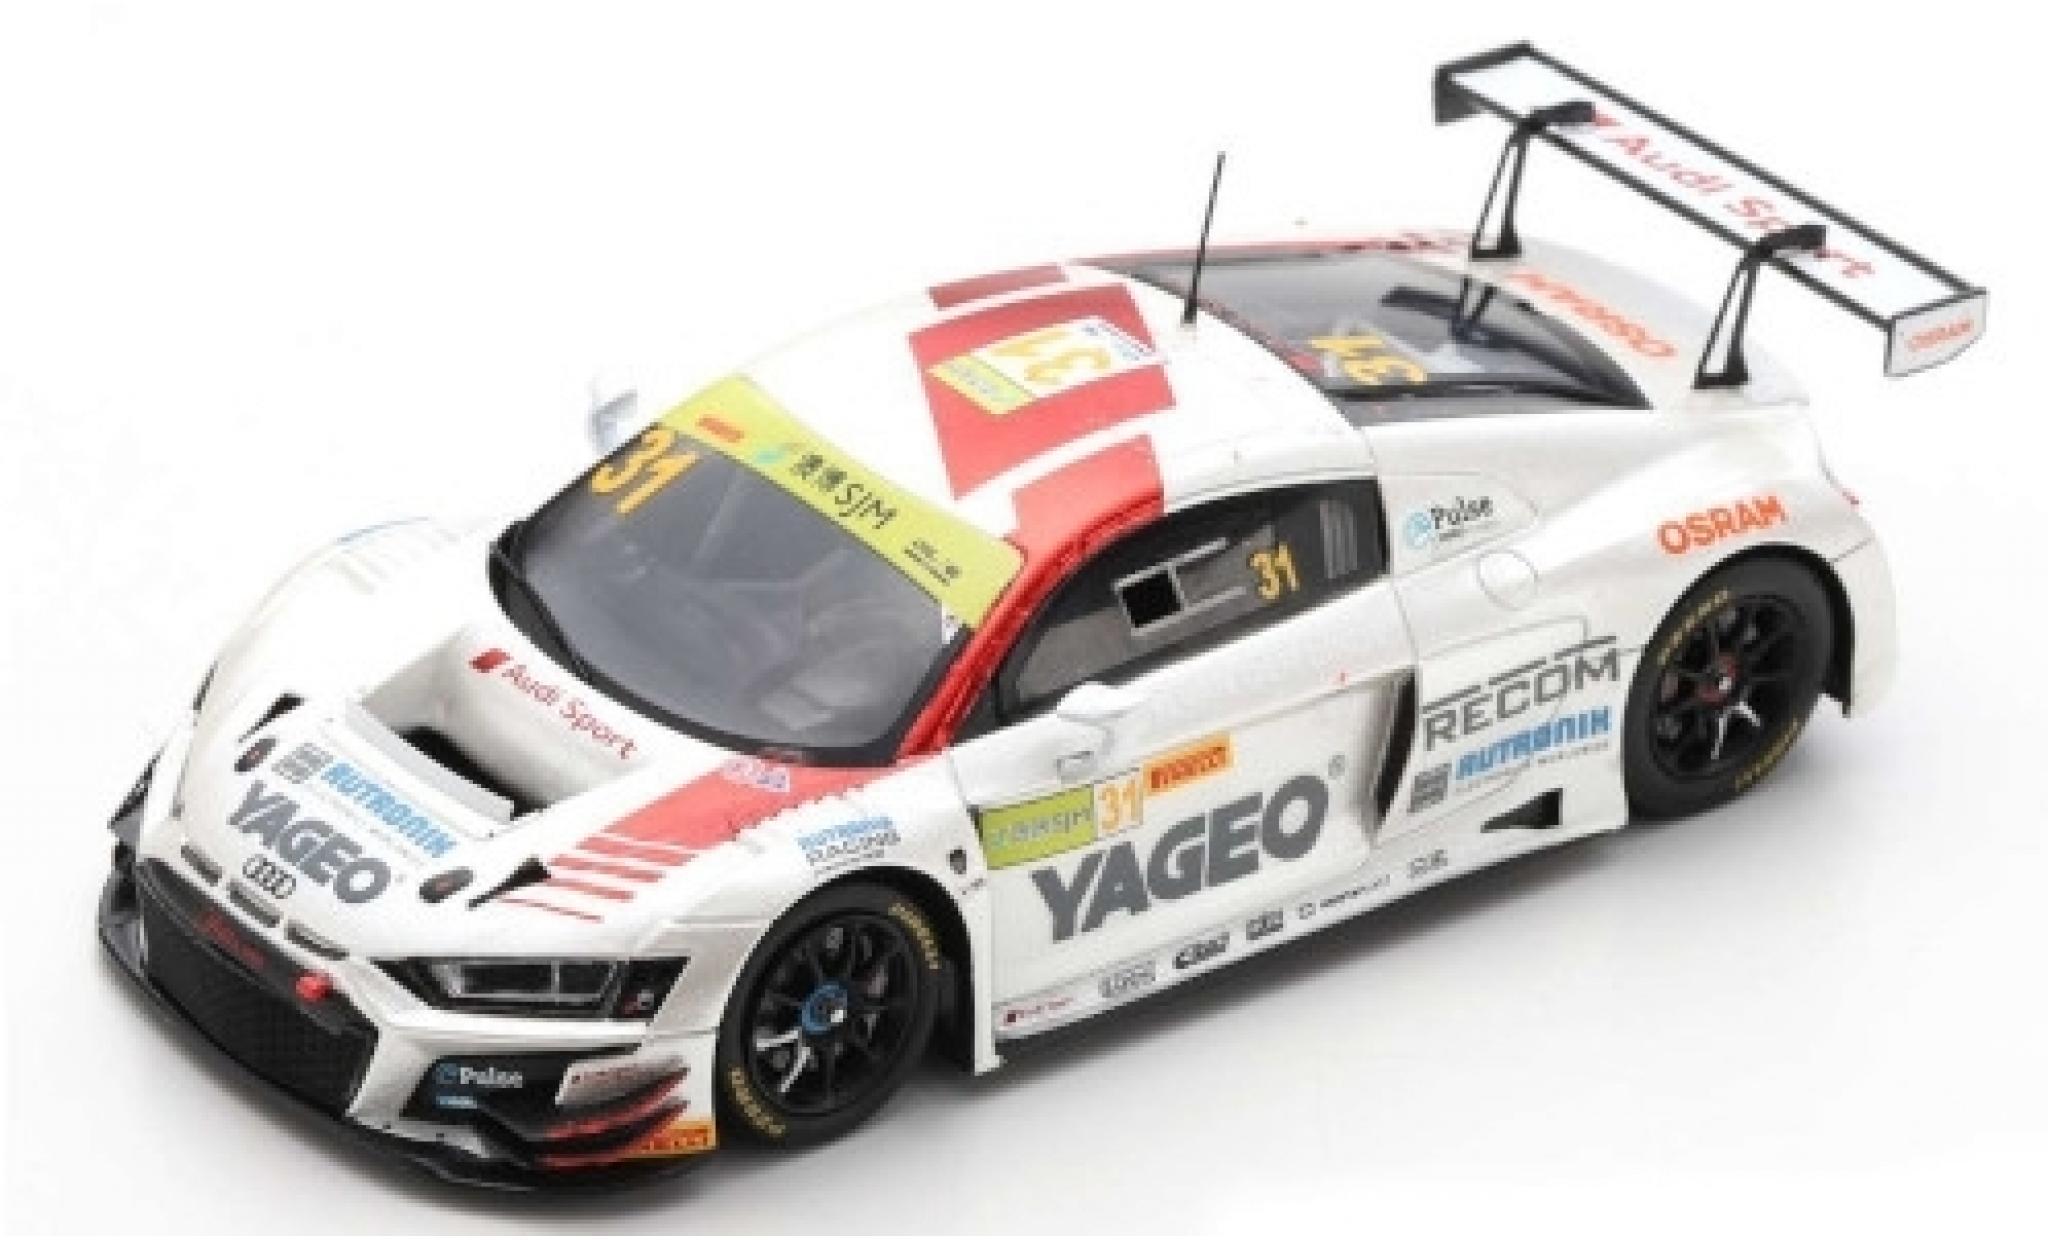 Audi R8 1/43 Spark LMS No.31 Sport Team Rutronik Yageo Fia GT World Cup Macau 2019 K.van le Linde